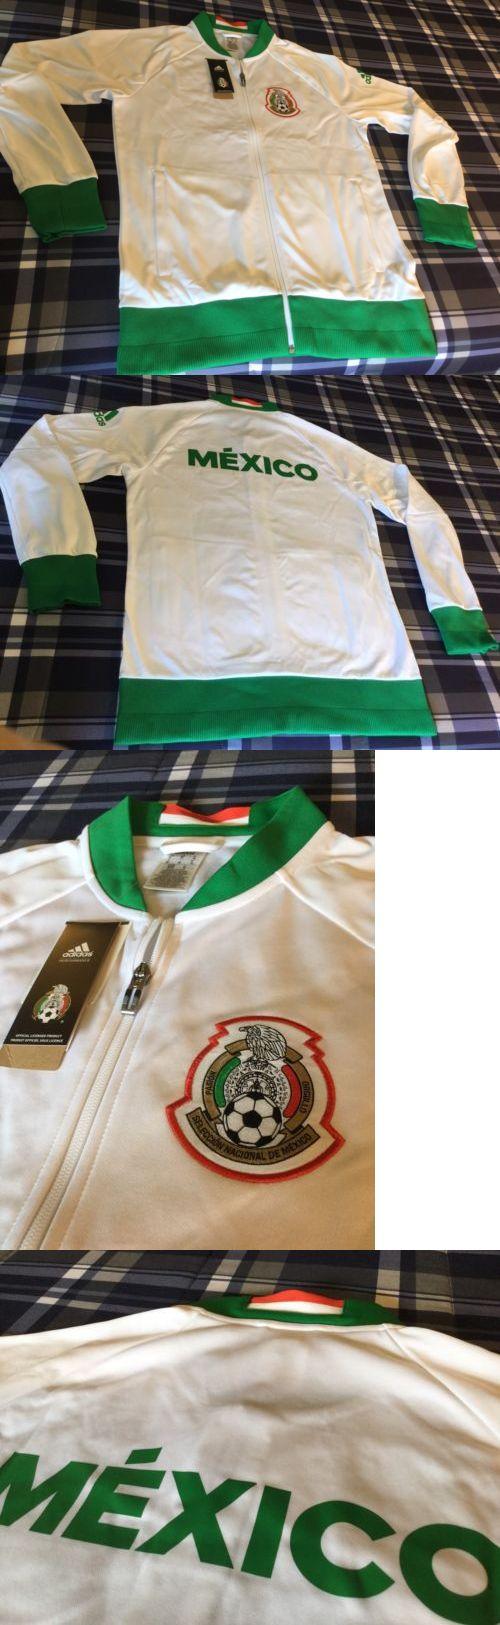 Men 123490: Seleccion Mexicana Futbol Mexico Adidas New W Tags Medium Size Track Jacket -> BUY IT NOW ONLY: $85 on eBay!